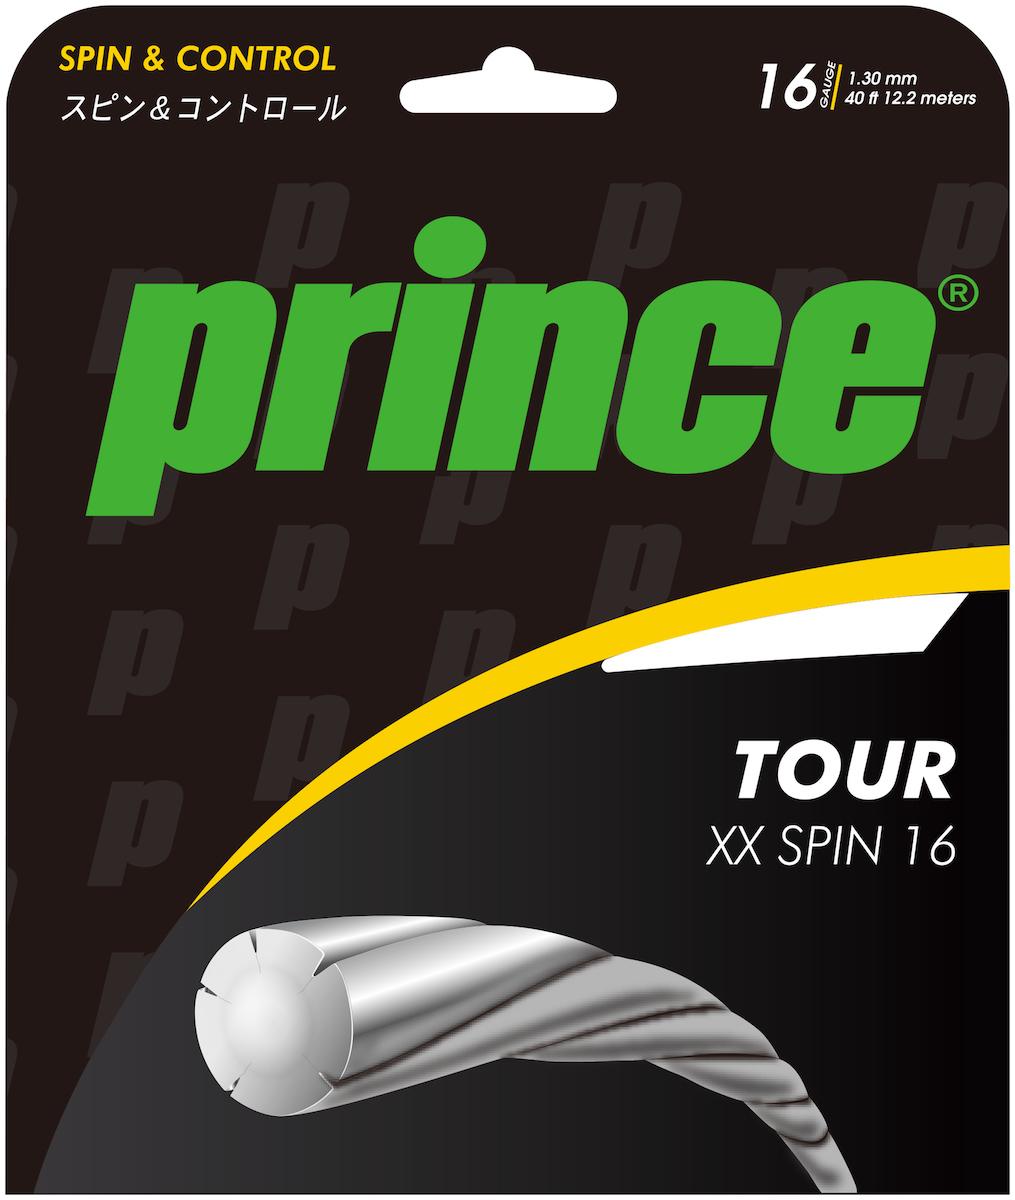 TOUR XX SPIN(ツアー ダブルエックス スピン) 16